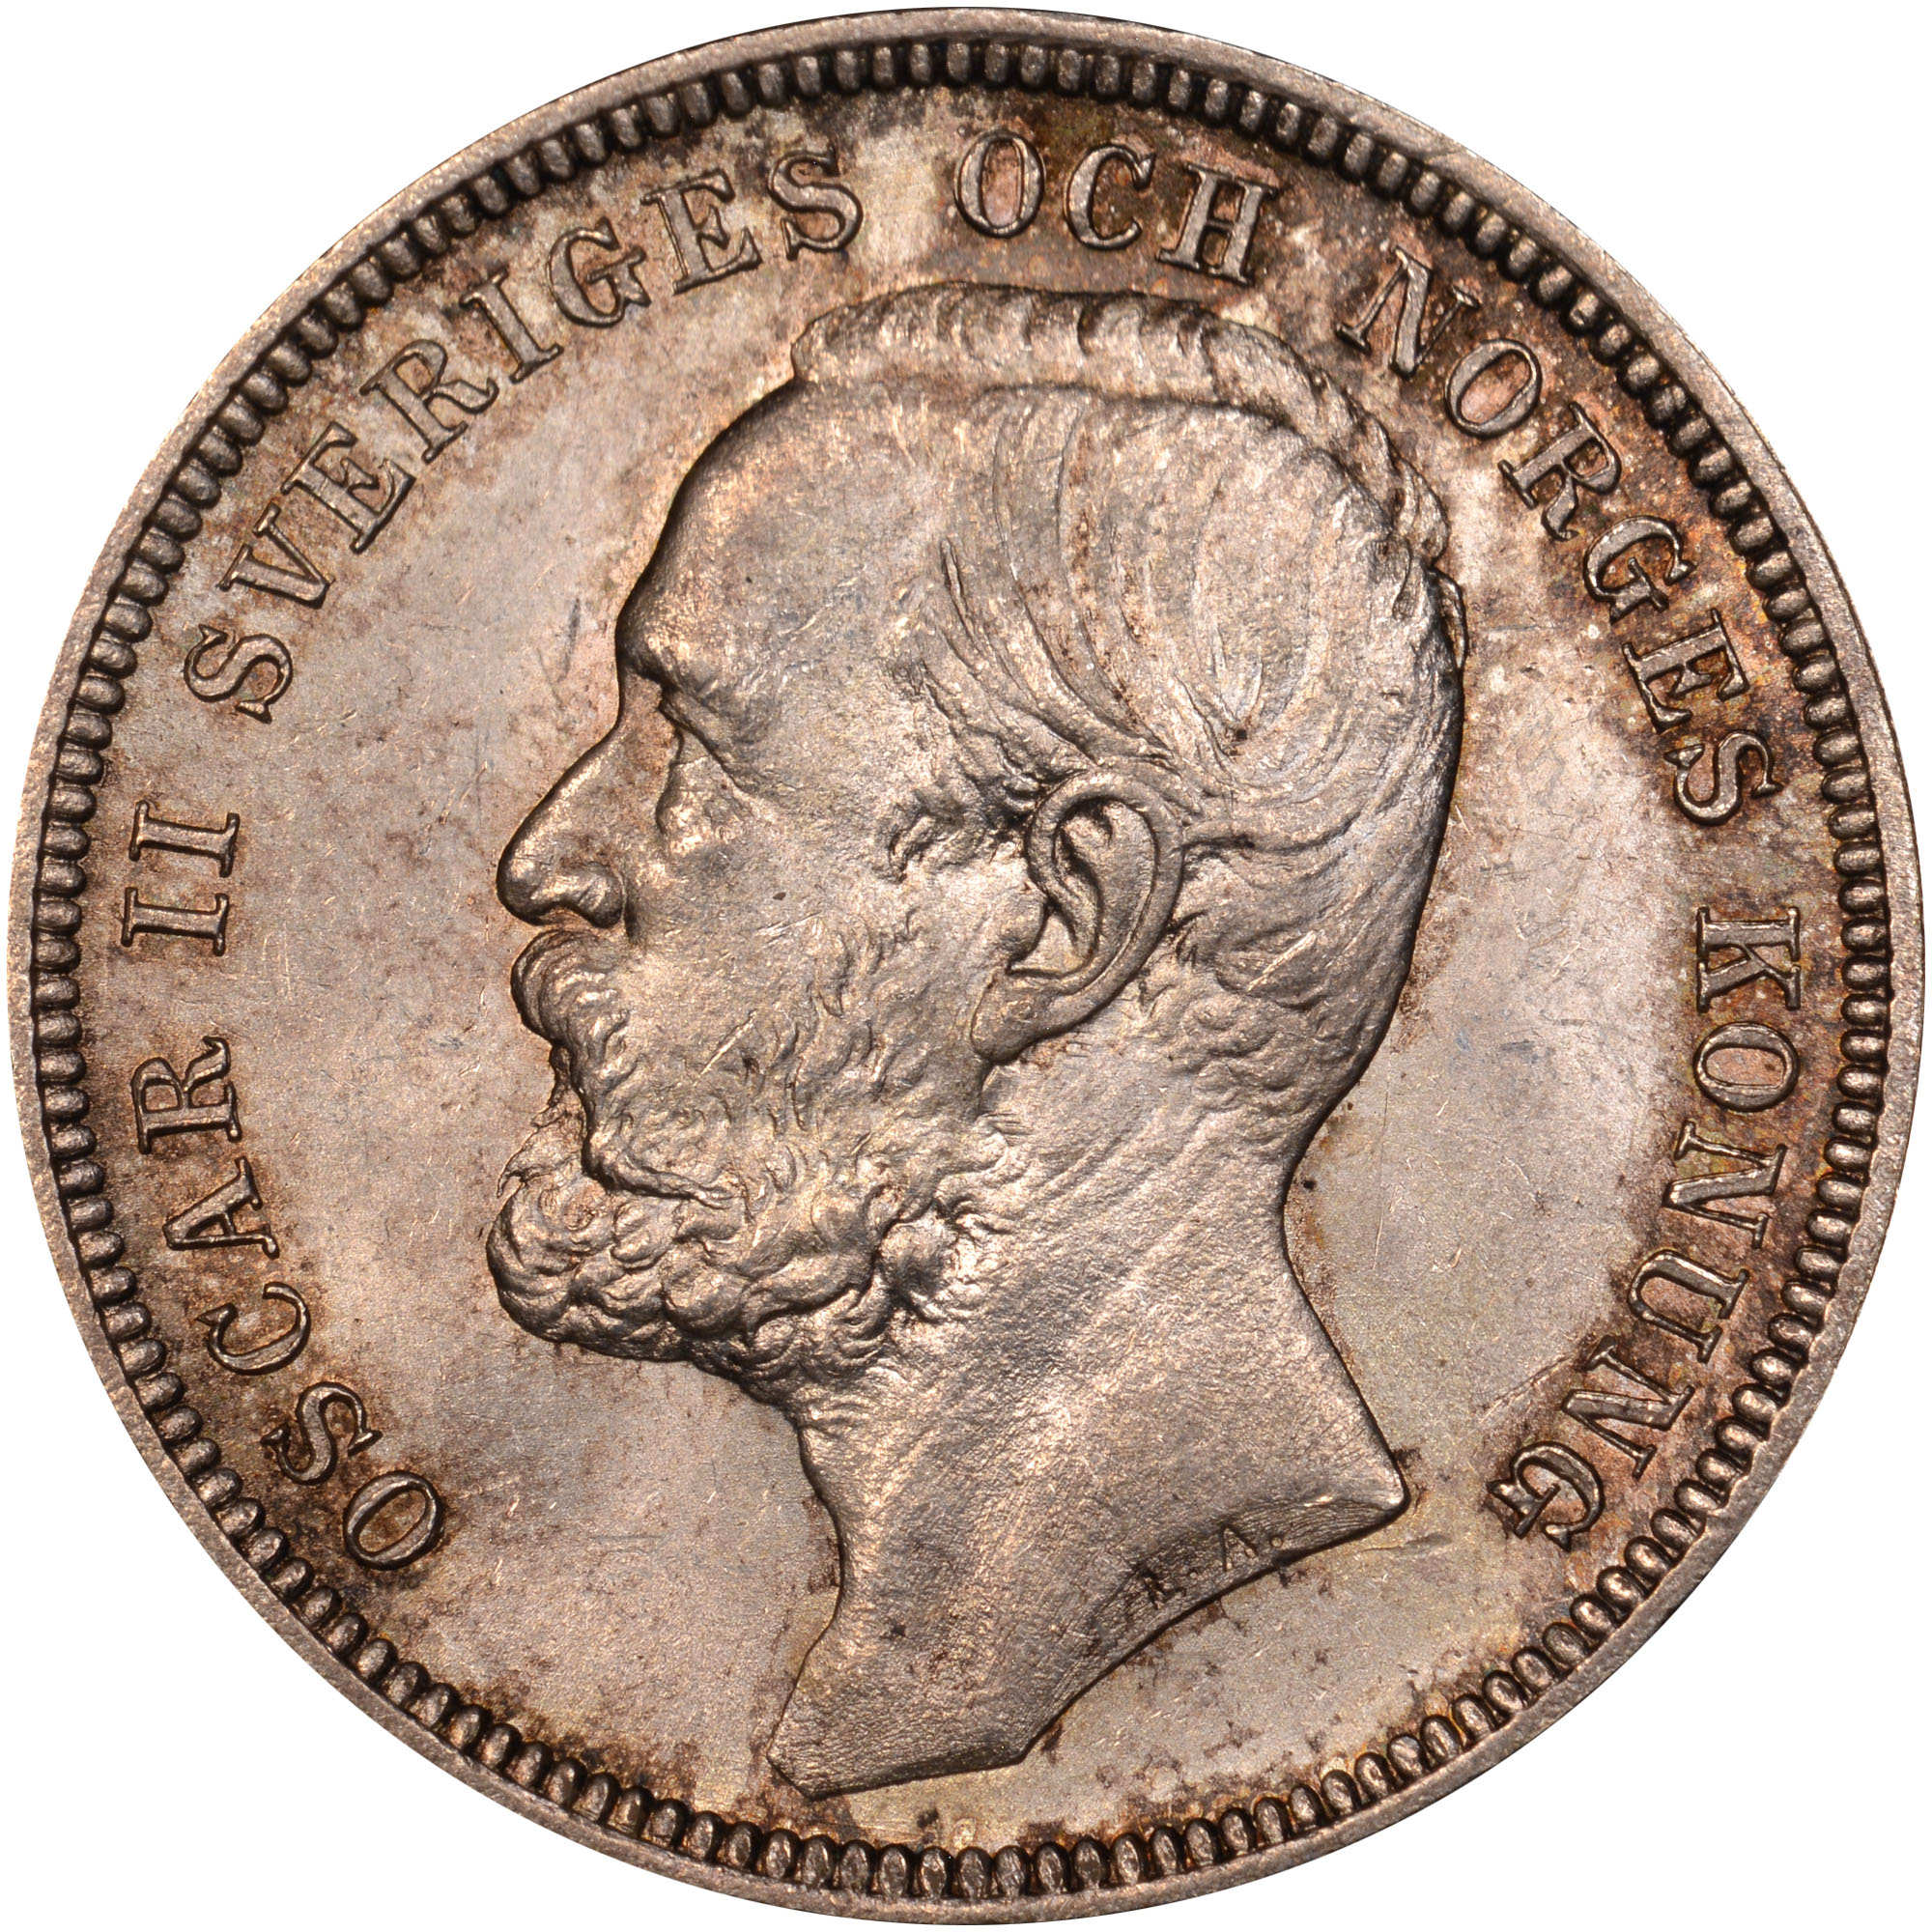 Sweden Krona KM 760 Prices & Values | NGC